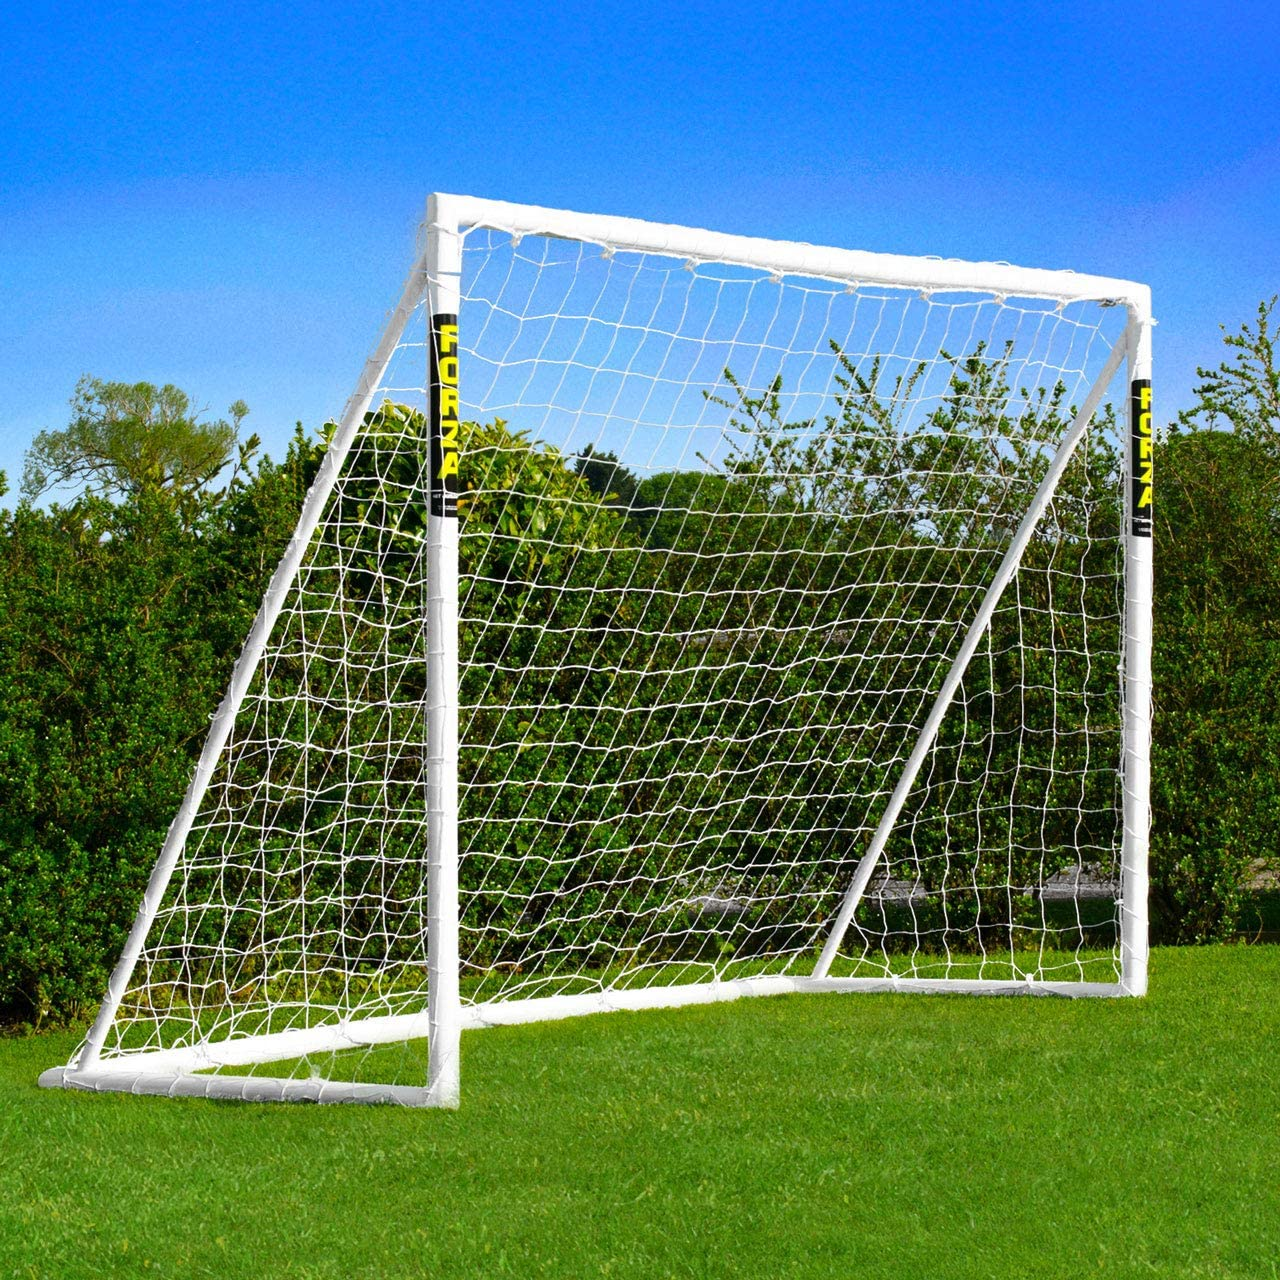 Amazon.com : Net World Sports Forza Soccer Goal 8x6 - The Premier Soccer  Goal Brand! Great Gift for Young Soccer Stars! : Backyard Soccer Goals :  Sports & Outdoors